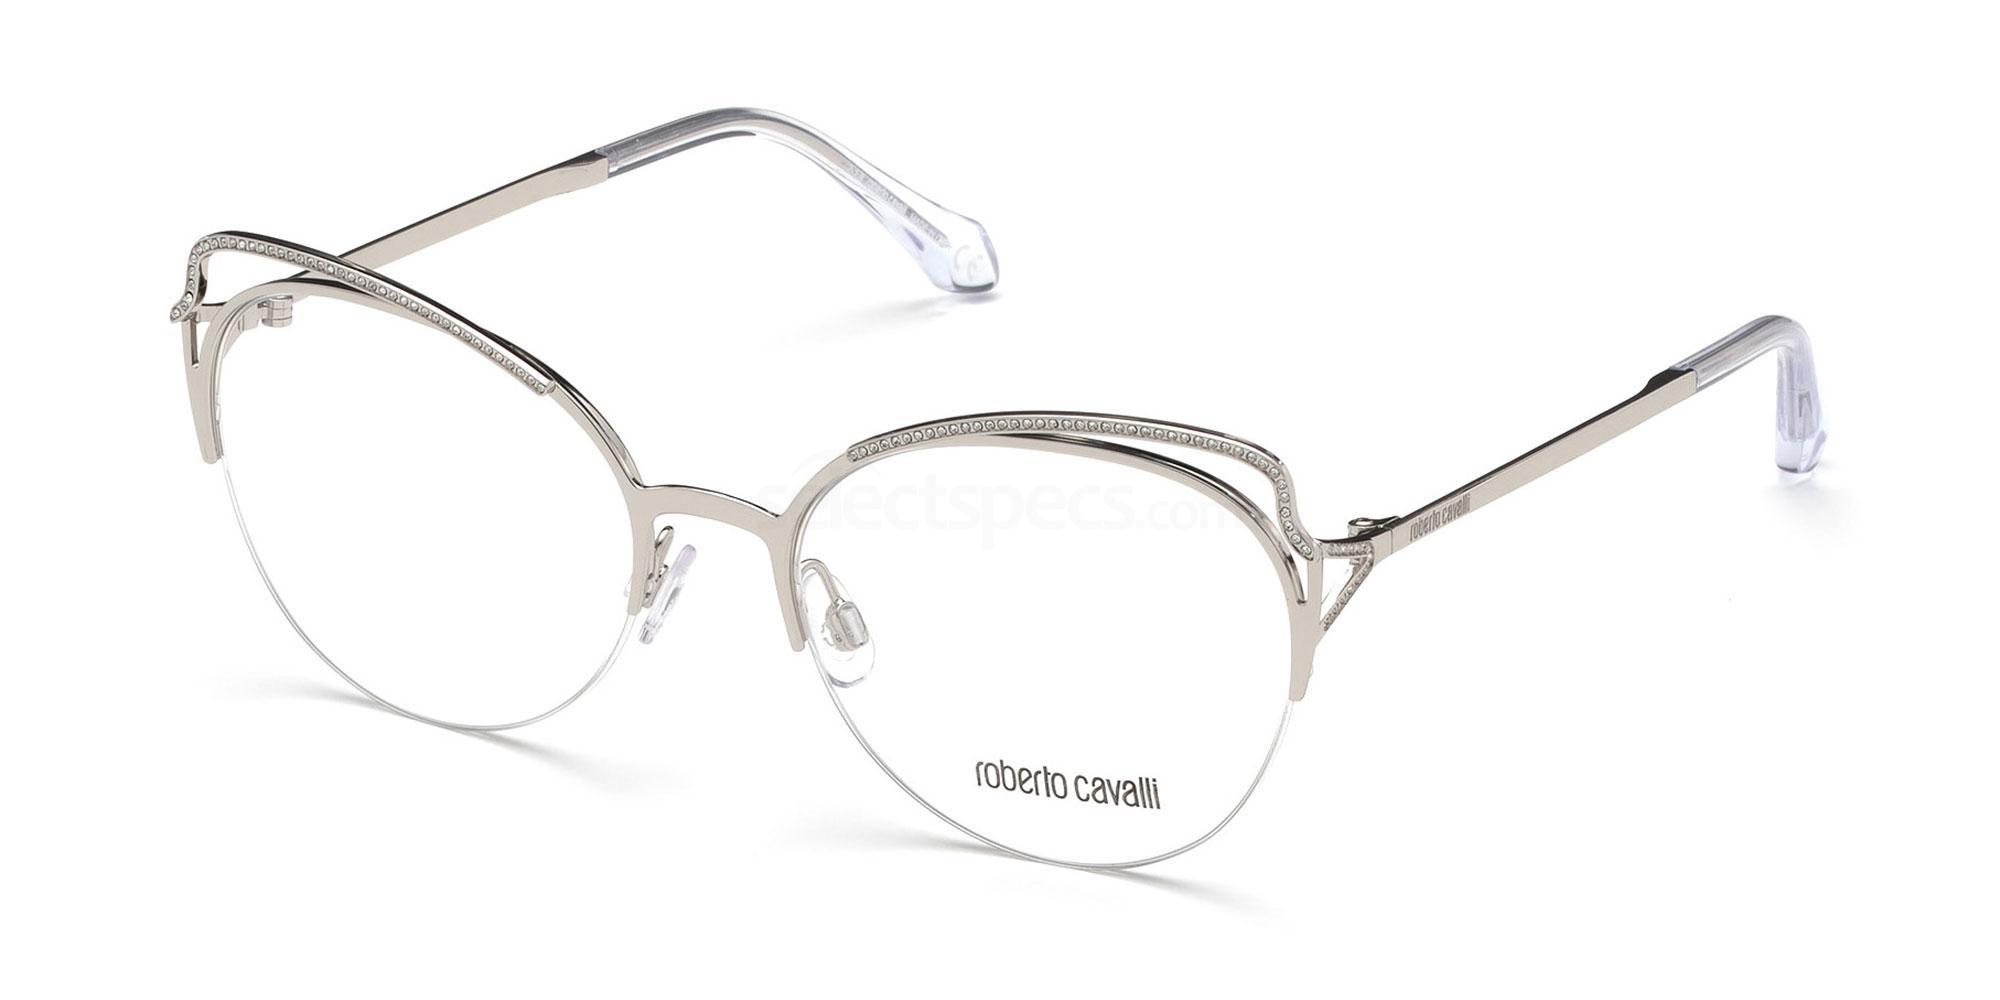 016 RC5076 Glasses, Roberto Cavalli